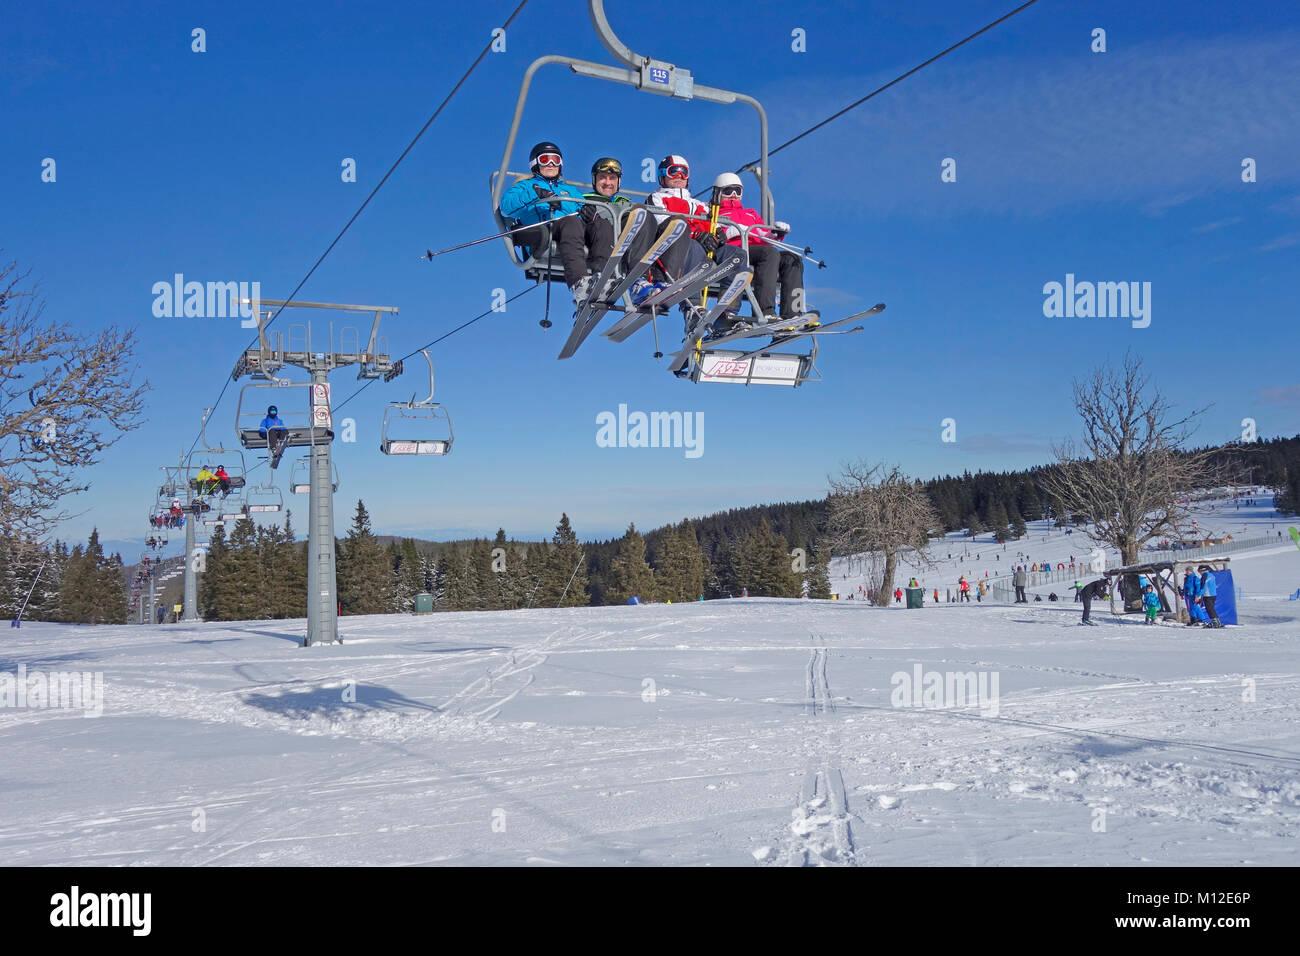 People riding the chair lift. Rogla ski resort, Pohorje, Slovenia. - Stock Image